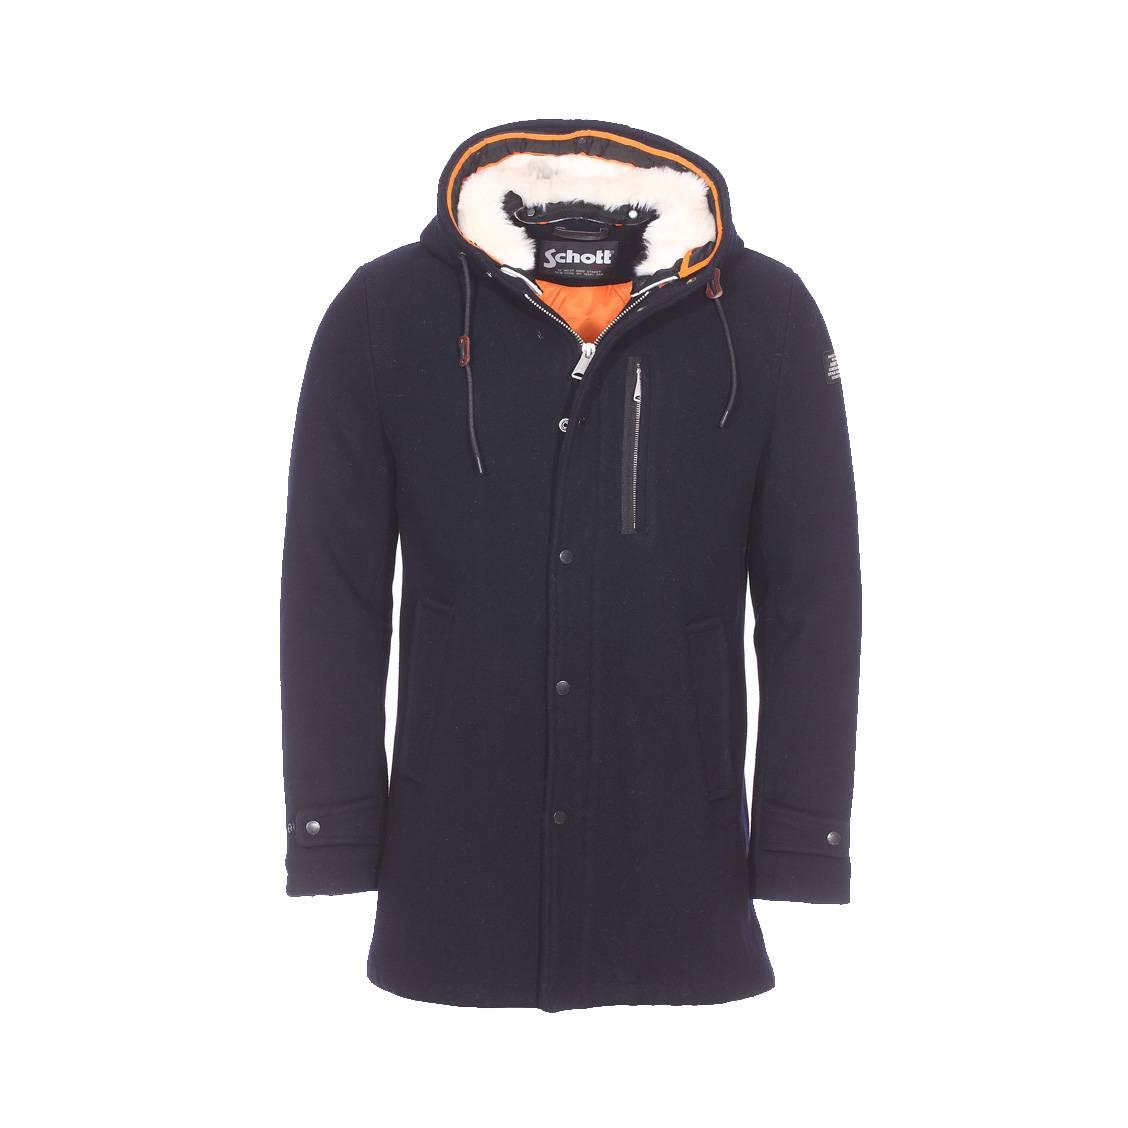 Schott nyc - manteau, caban, duffle coat